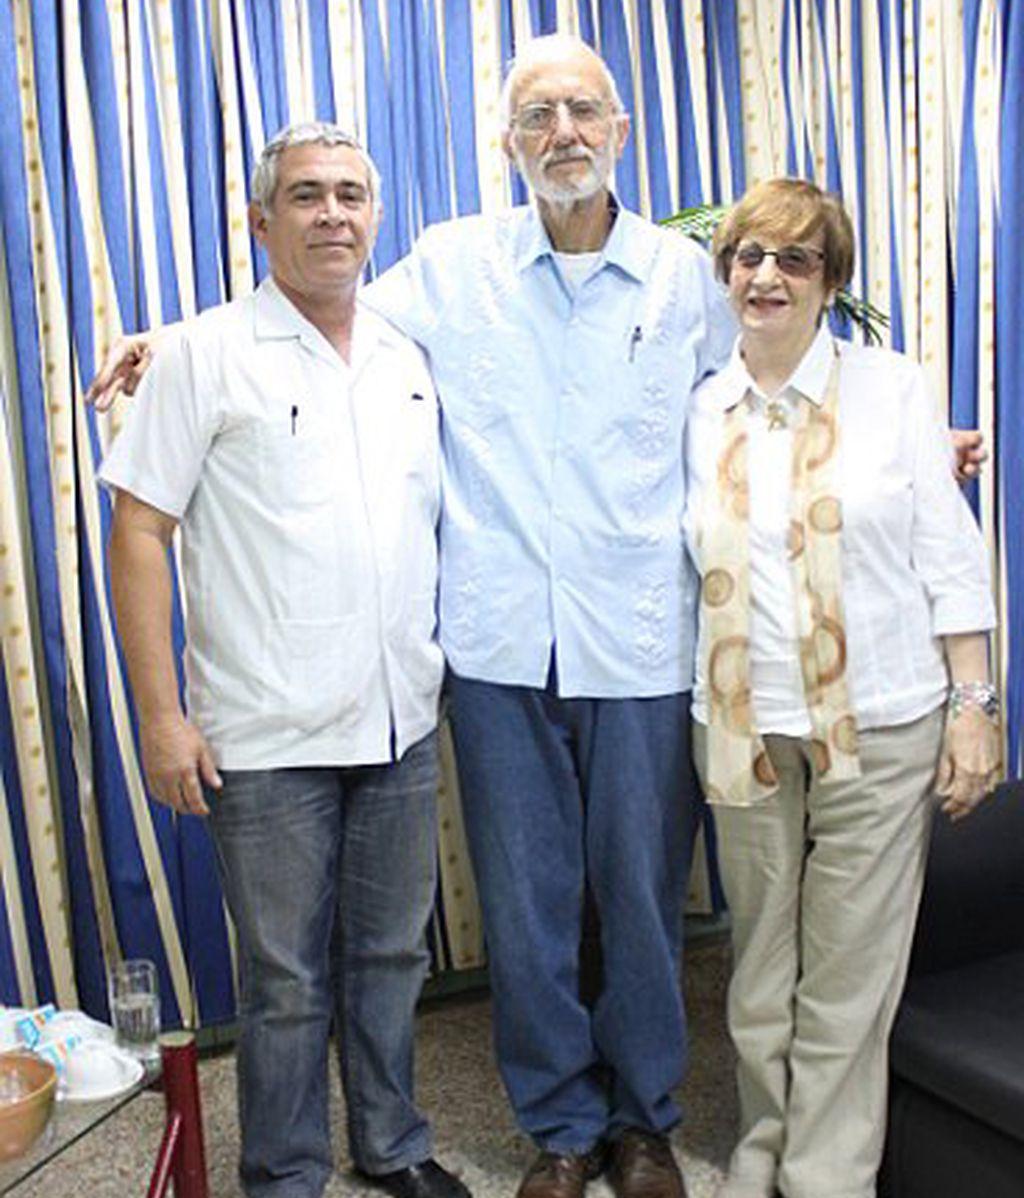 Cuba deja en libertad al empresario estadounidense Alan Gross